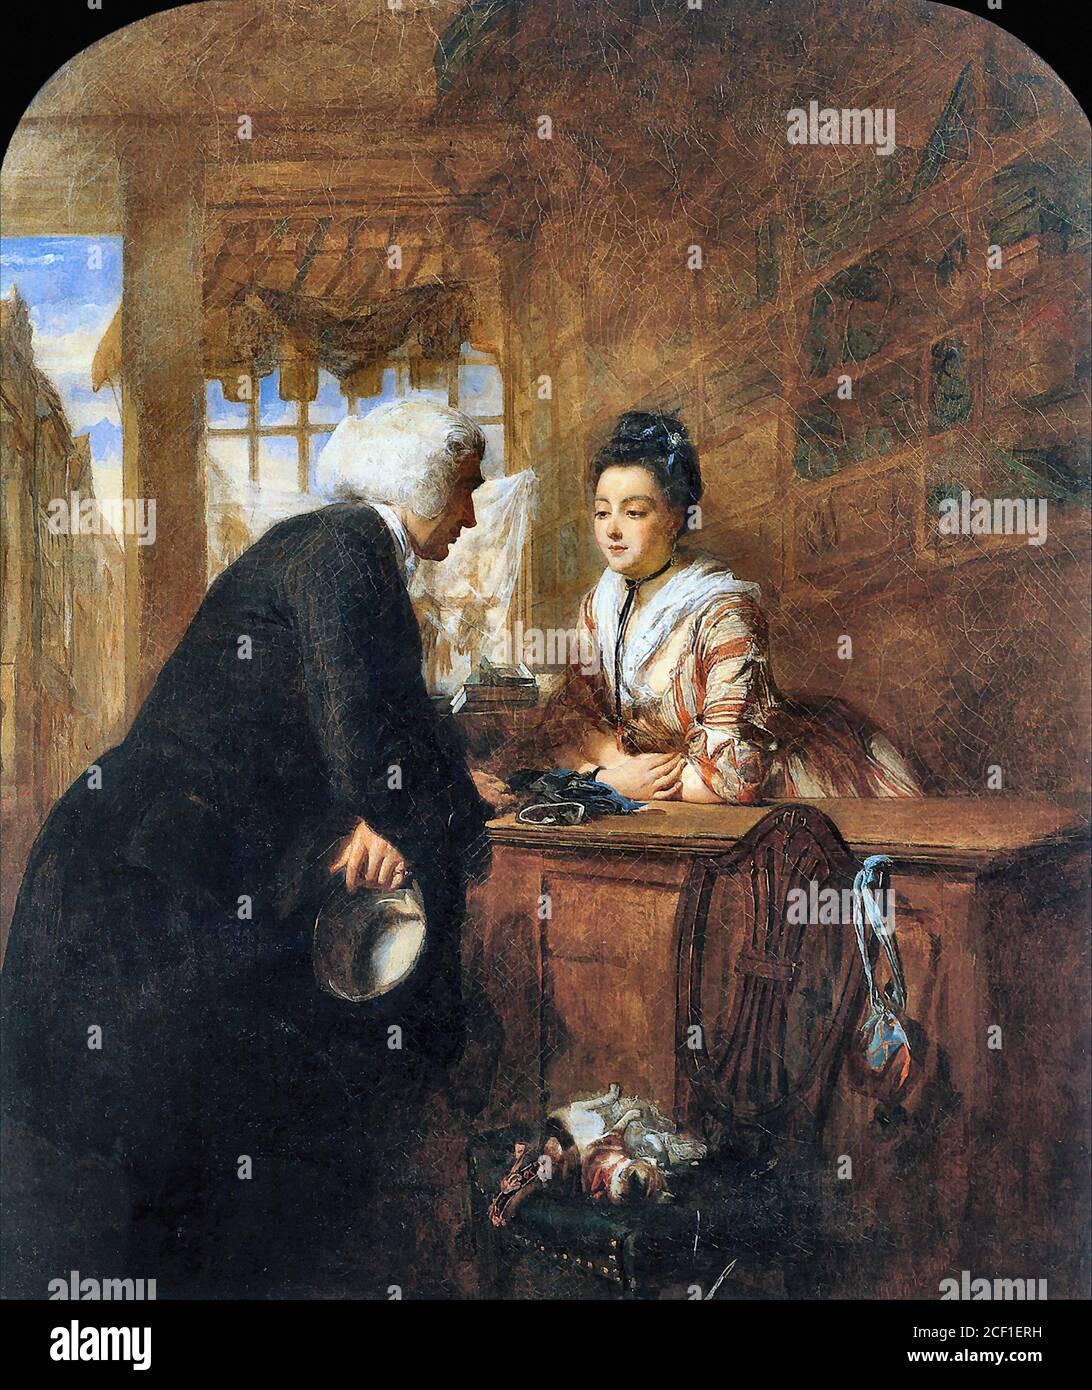 Frith William Powell - escena de 'un viaje sentimental' - Escuela Británica - siglo XIX Foto de stock